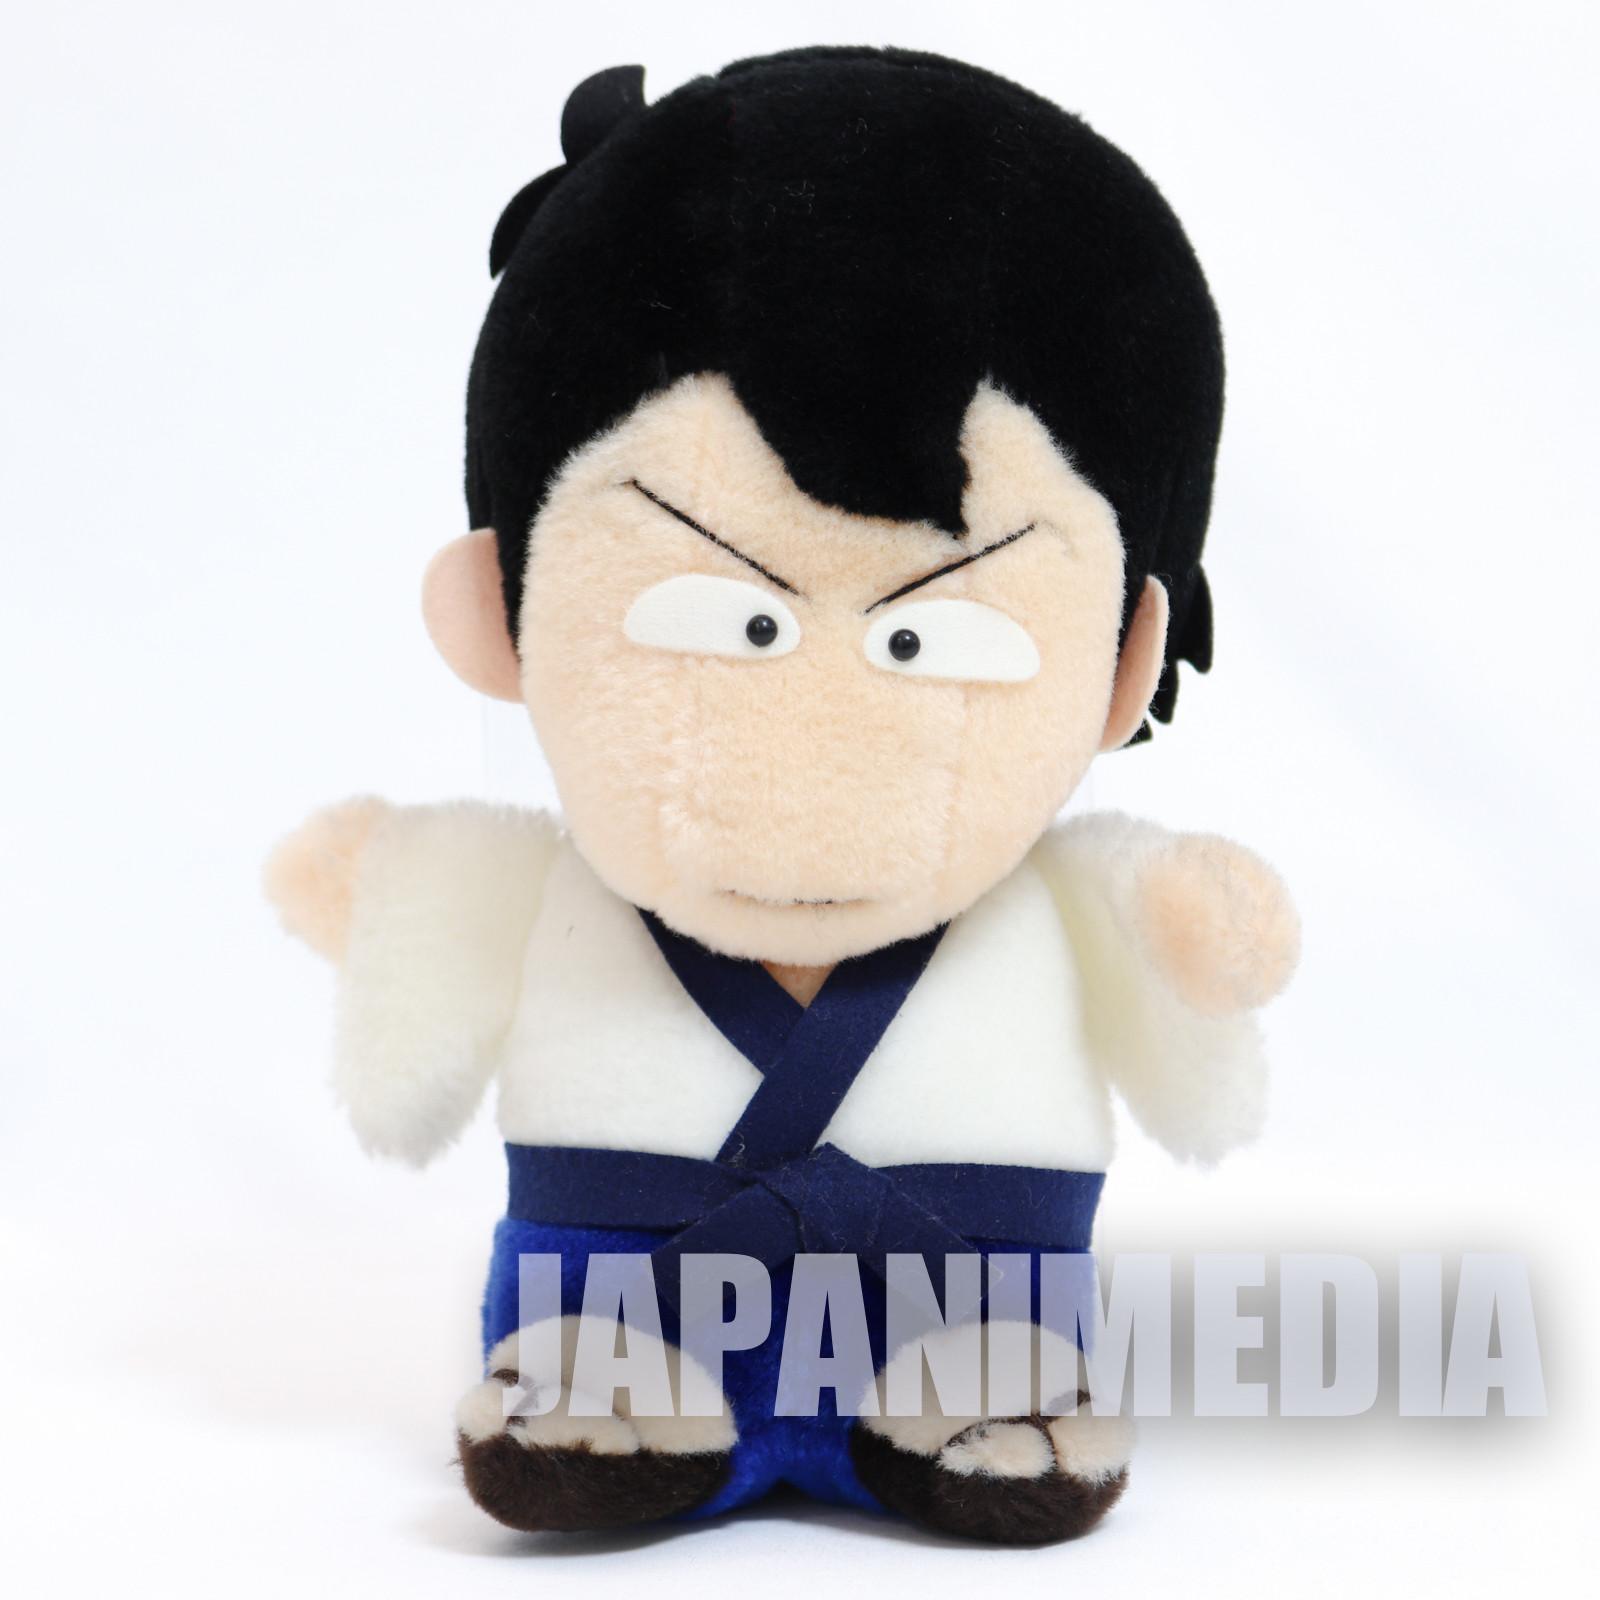 "Retro RARE! Lupin the 3rd Third Goemon Ishikawa Plush Doll 9"" JAPAN ANIME MANGA"